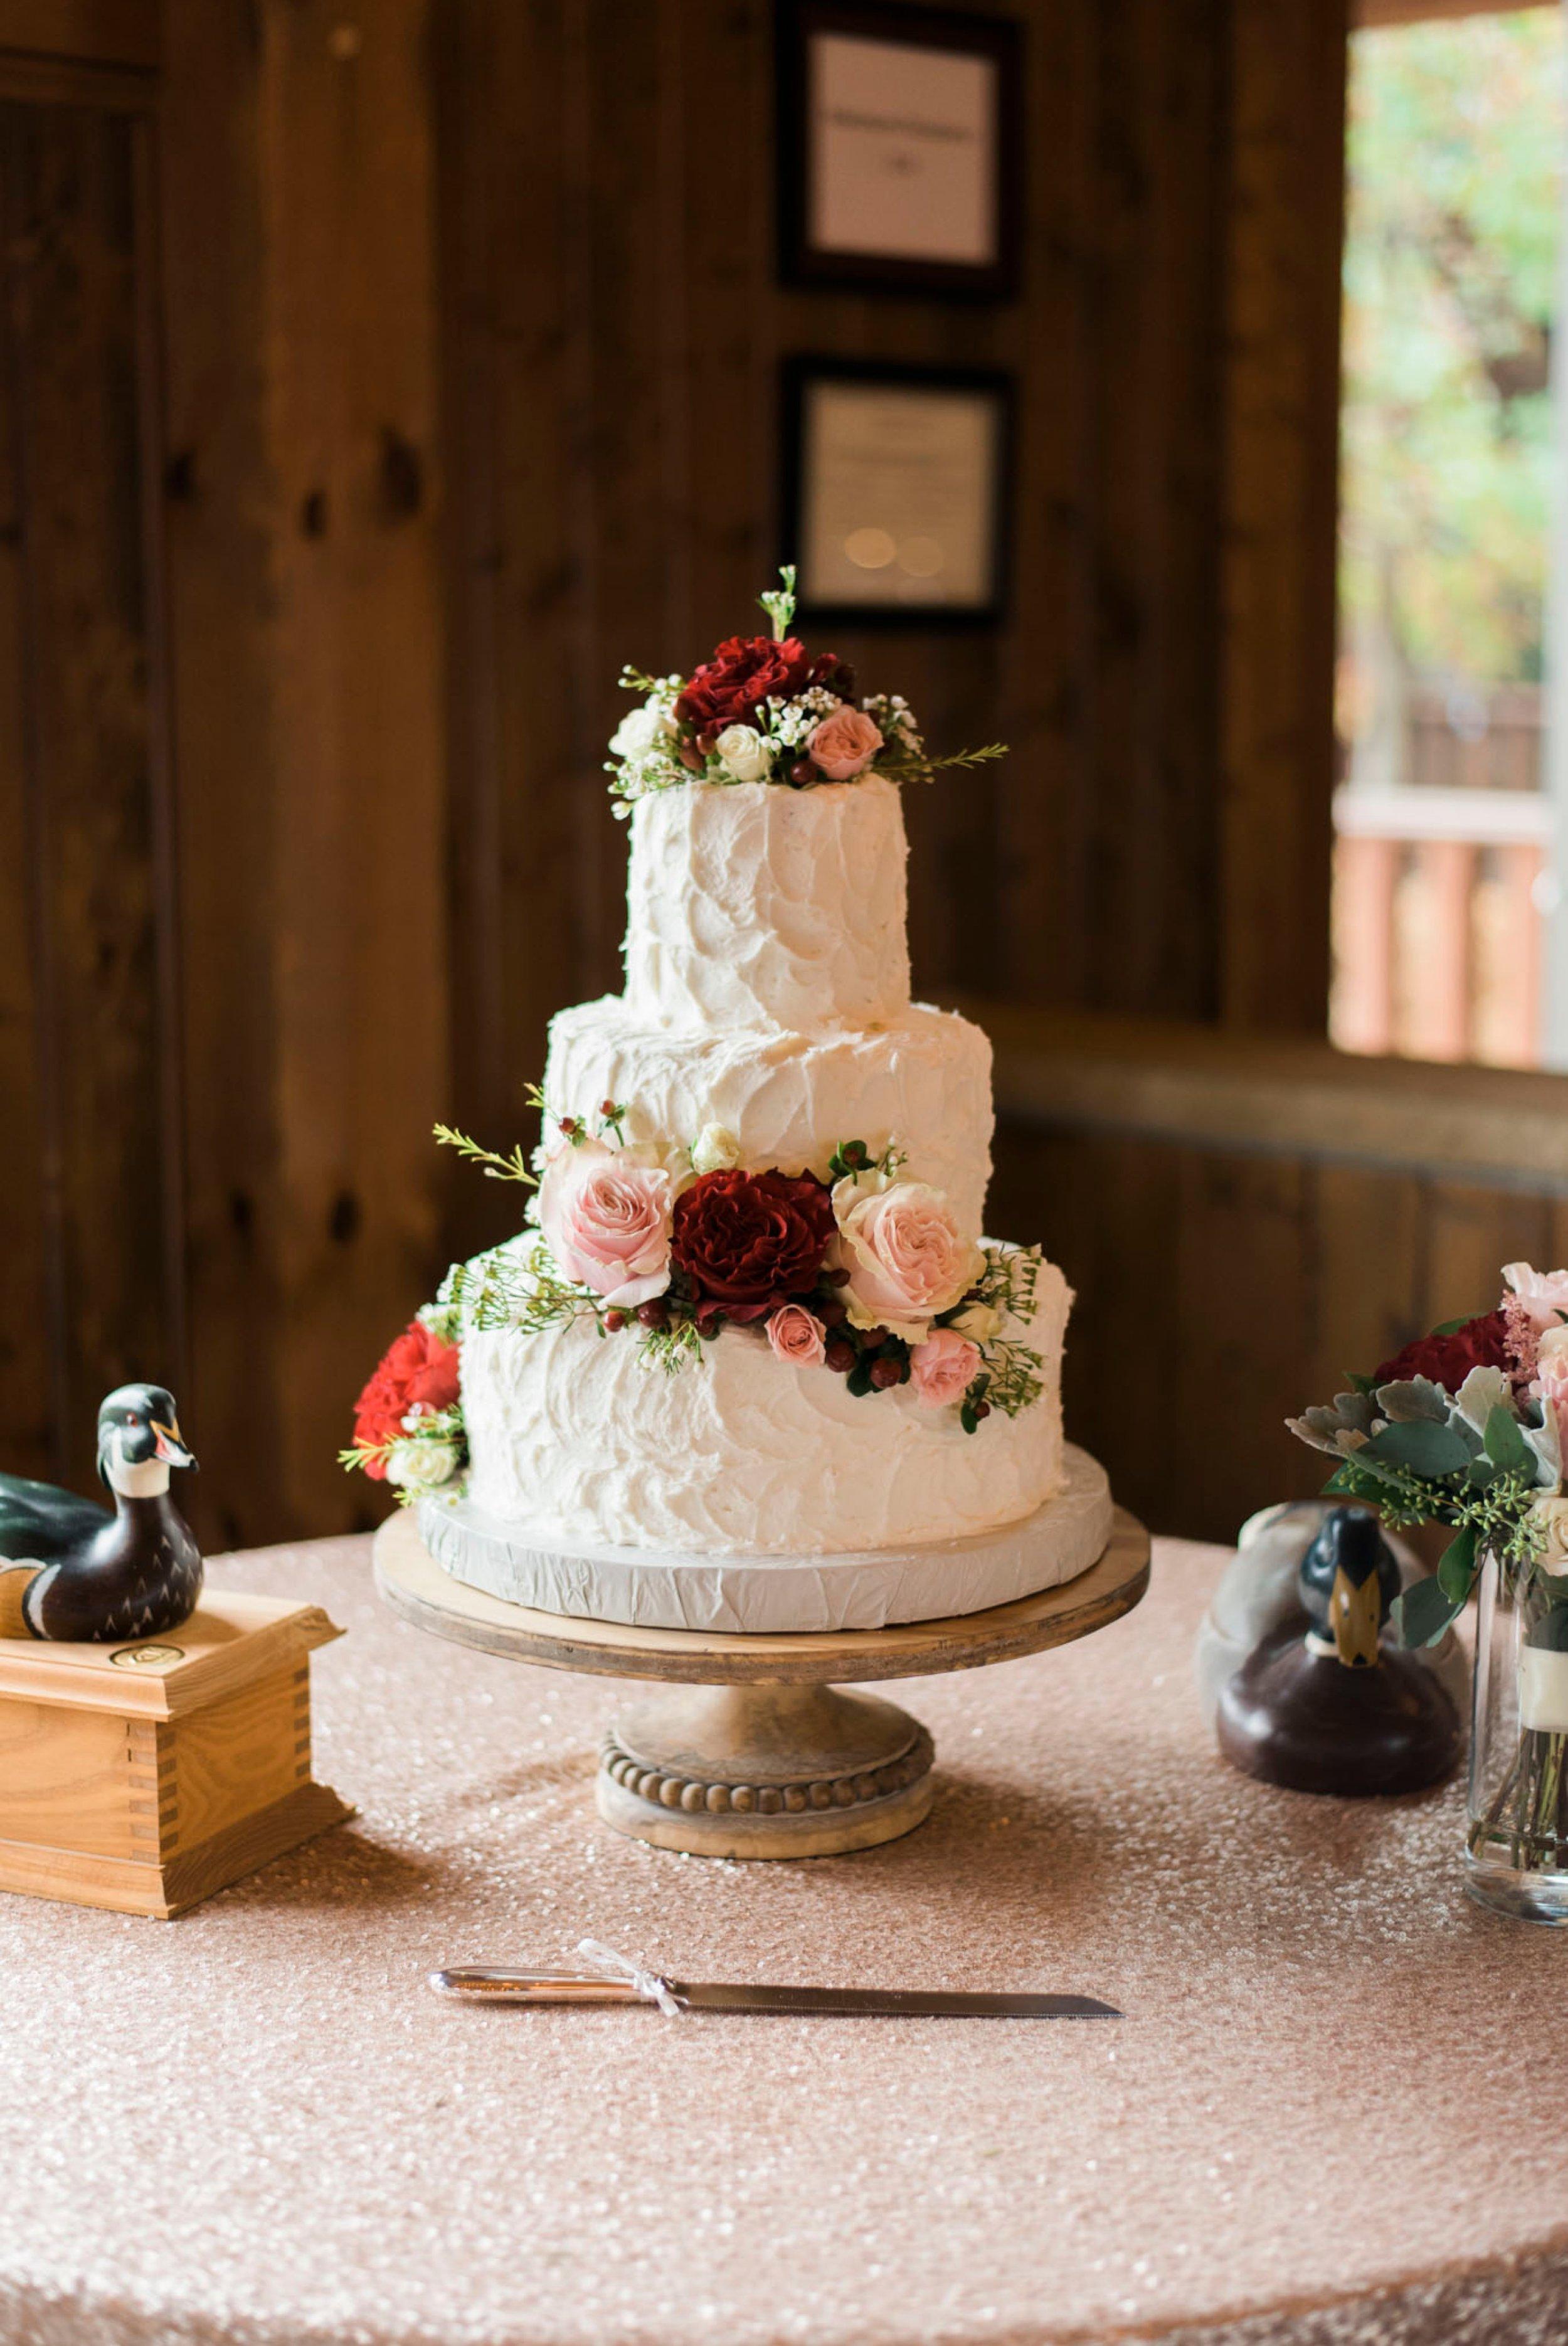 IrvineEstate_LexingtonVA_Wedding_FallWedding_VirginiaWeddingPhotographer 53.jpg